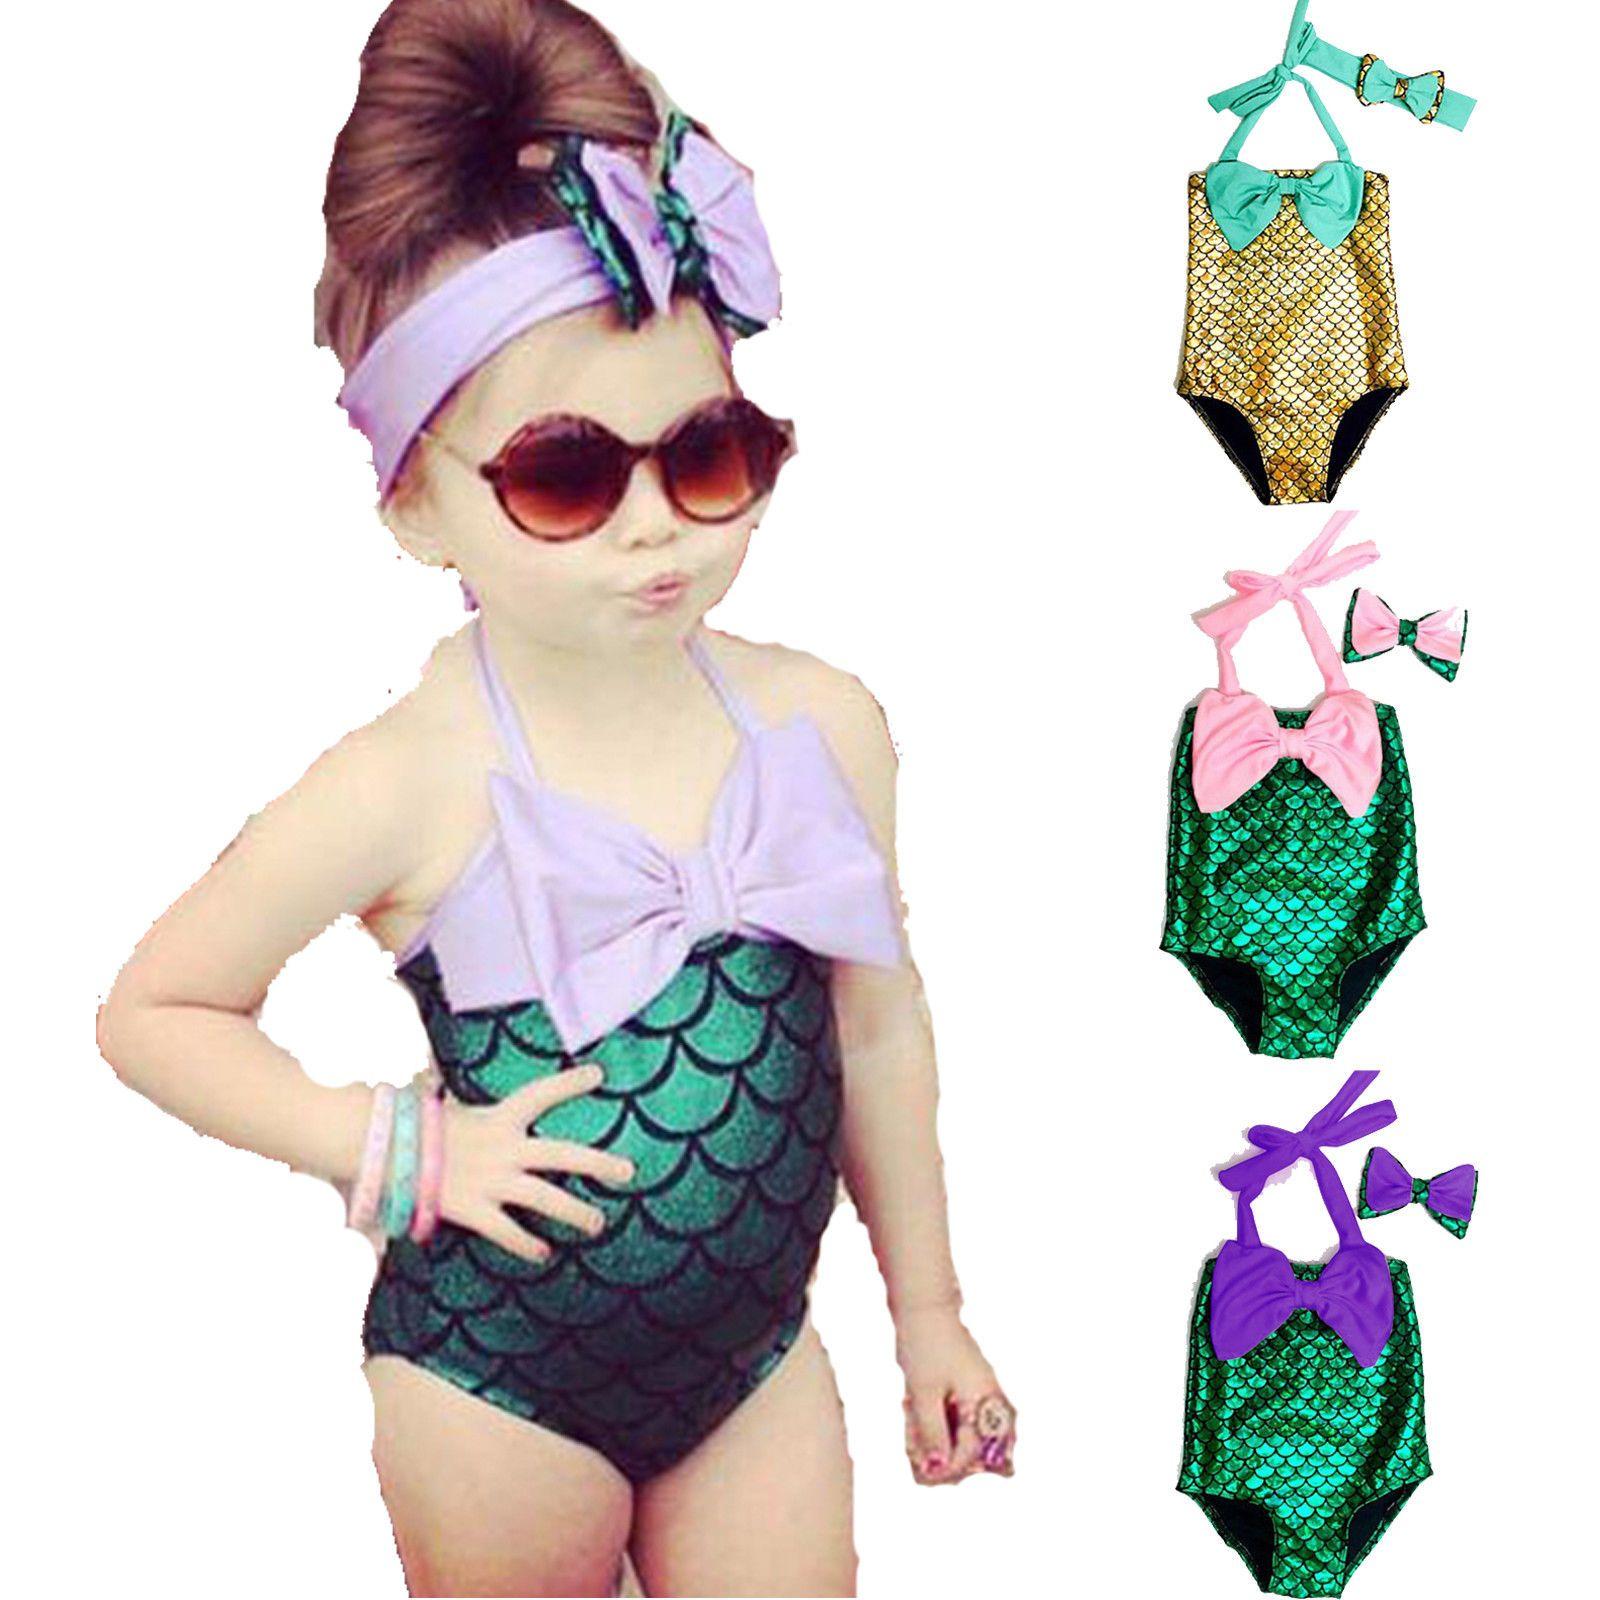 Best Baby Girls Mermaid Bikini Suit Swimming Princess Costume Swimsuit Kids Toddler Girls Swimming Suits 3styles Ffa071 Under $6.06 | Dhgate.Com  sc 1 st  DHgate.com & Best Baby Girls Mermaid Bikini Suit Swimming Princess Costume ...